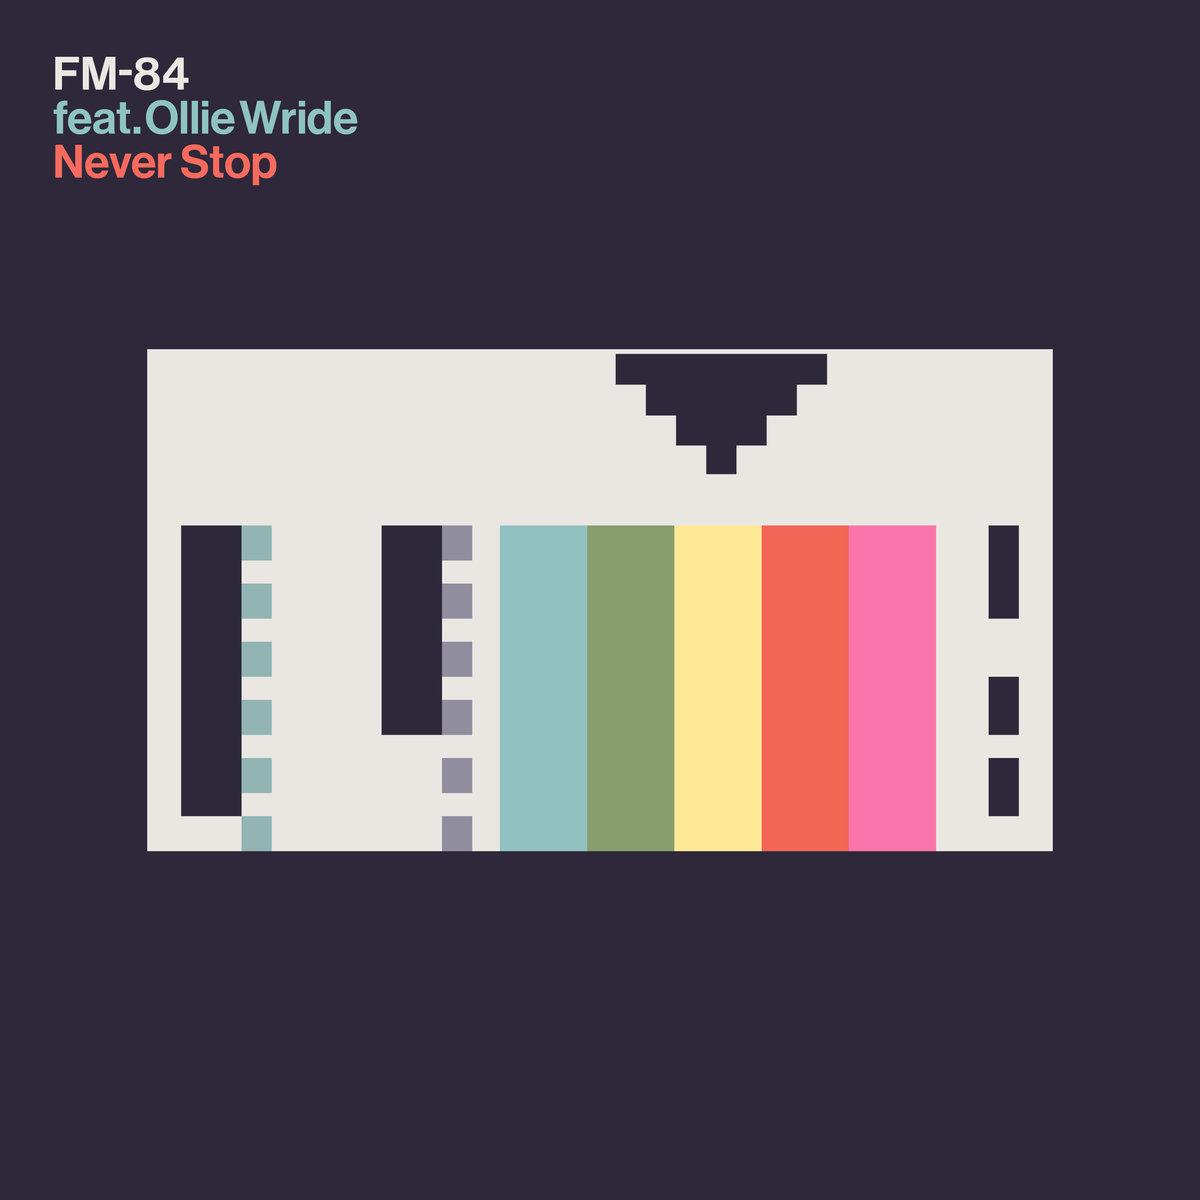 FM-84 - Never Stop